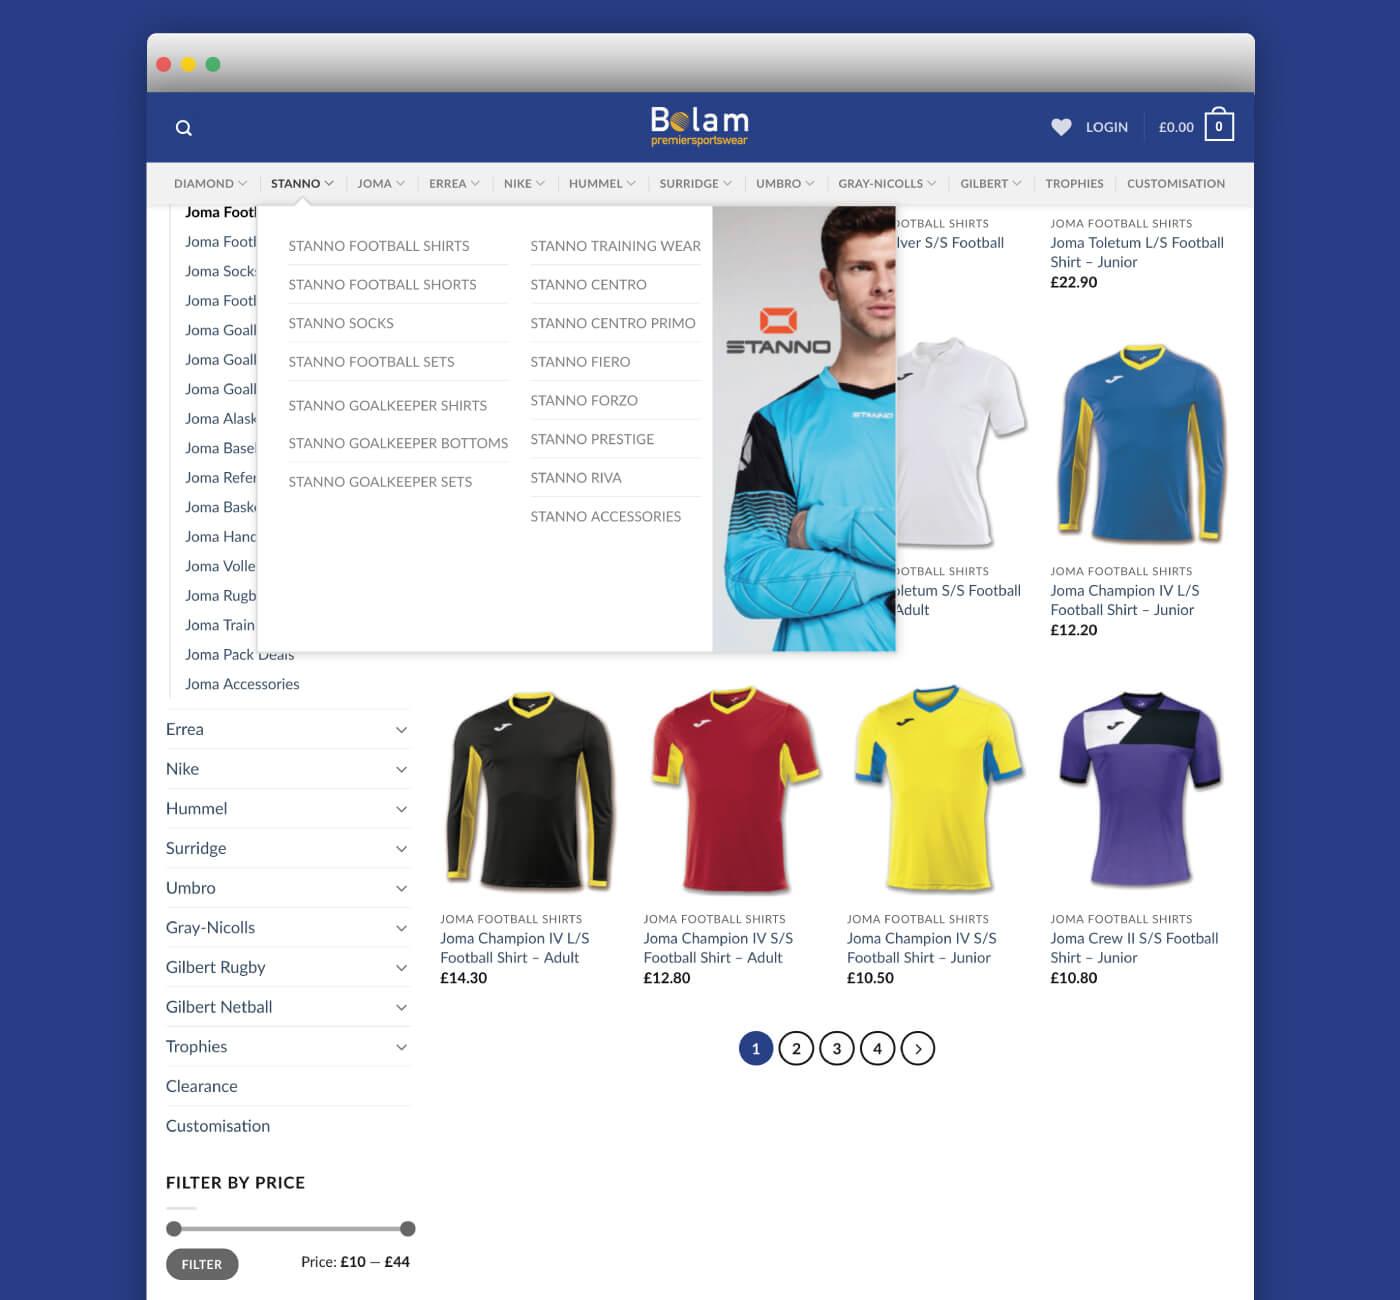 Bolam Premier Sportswear Mega Menu